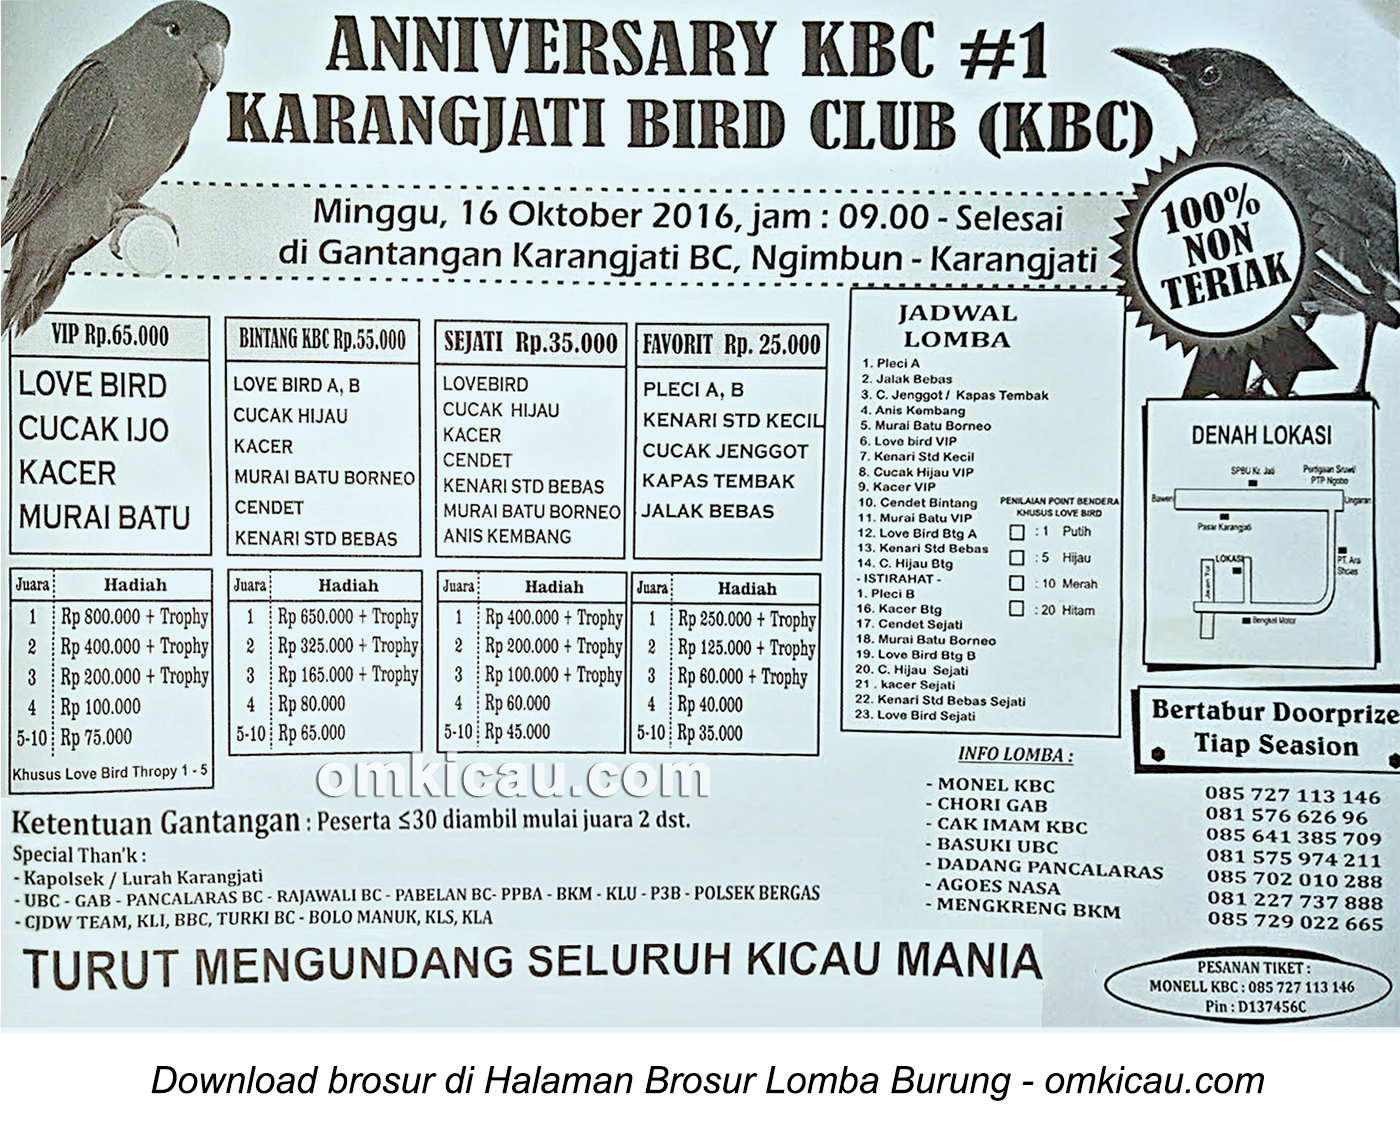 Brosur Lomba Burung Berkicau Anniversary KBC #1, Ungaran, 16 Oktober 2016